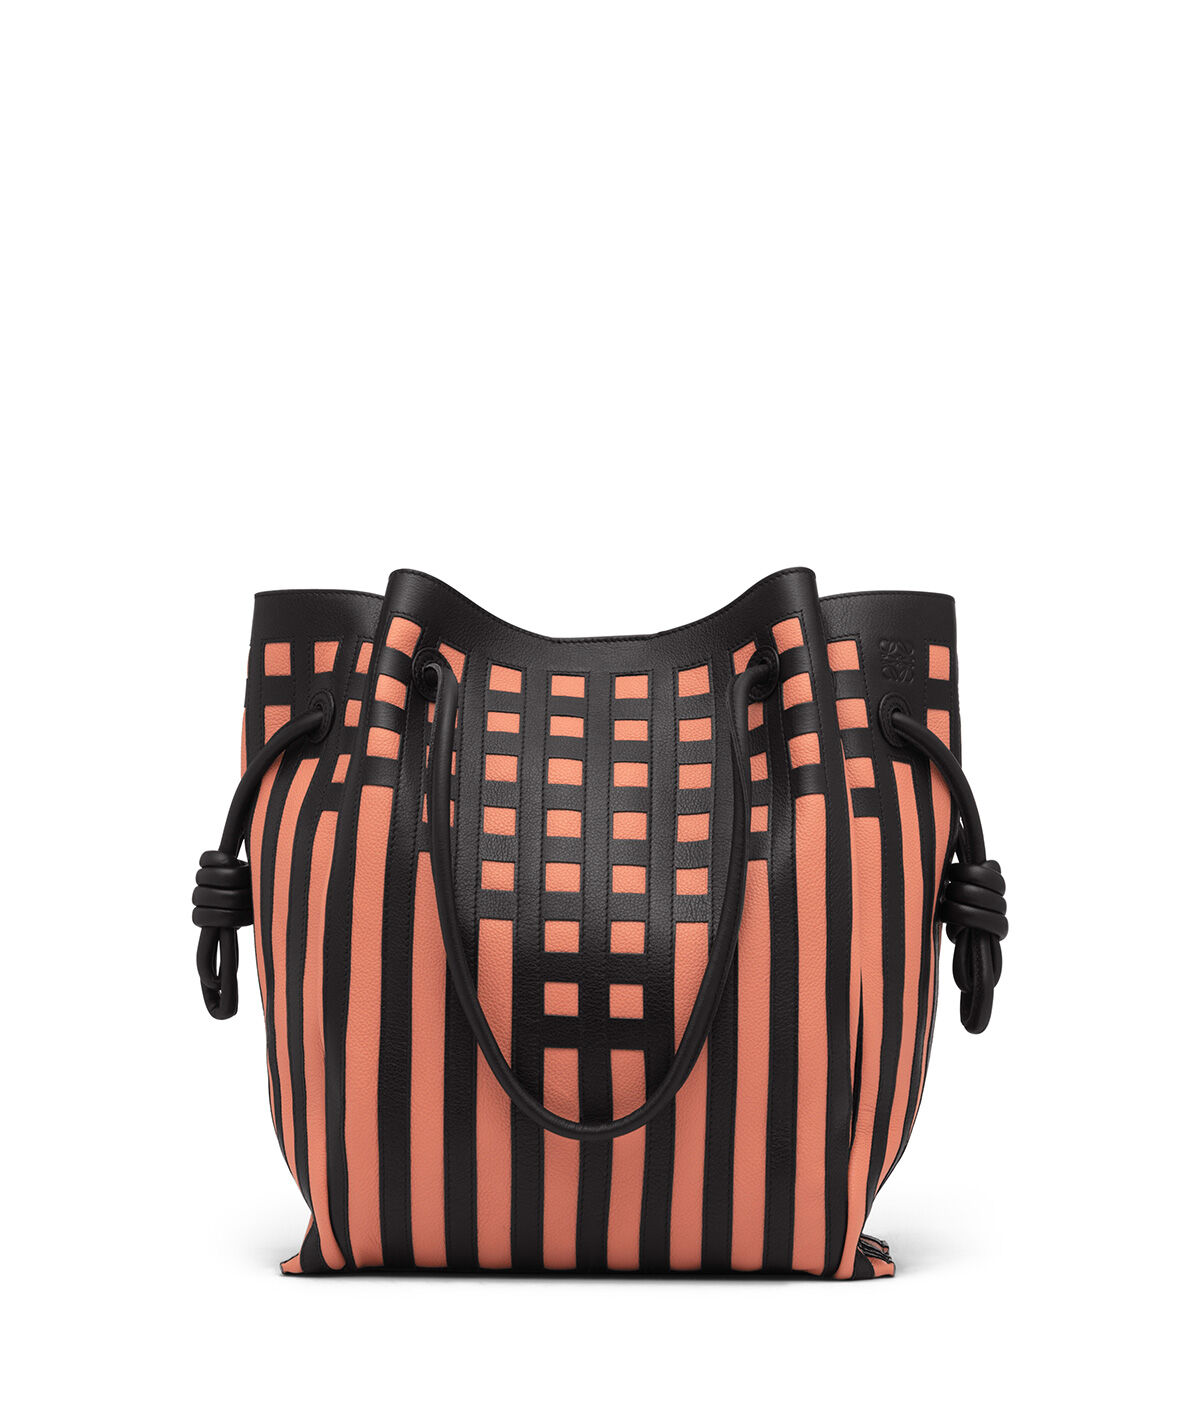 LOEWE Flamenco Knot Tote Grid Bag Black/Pink Tulip all